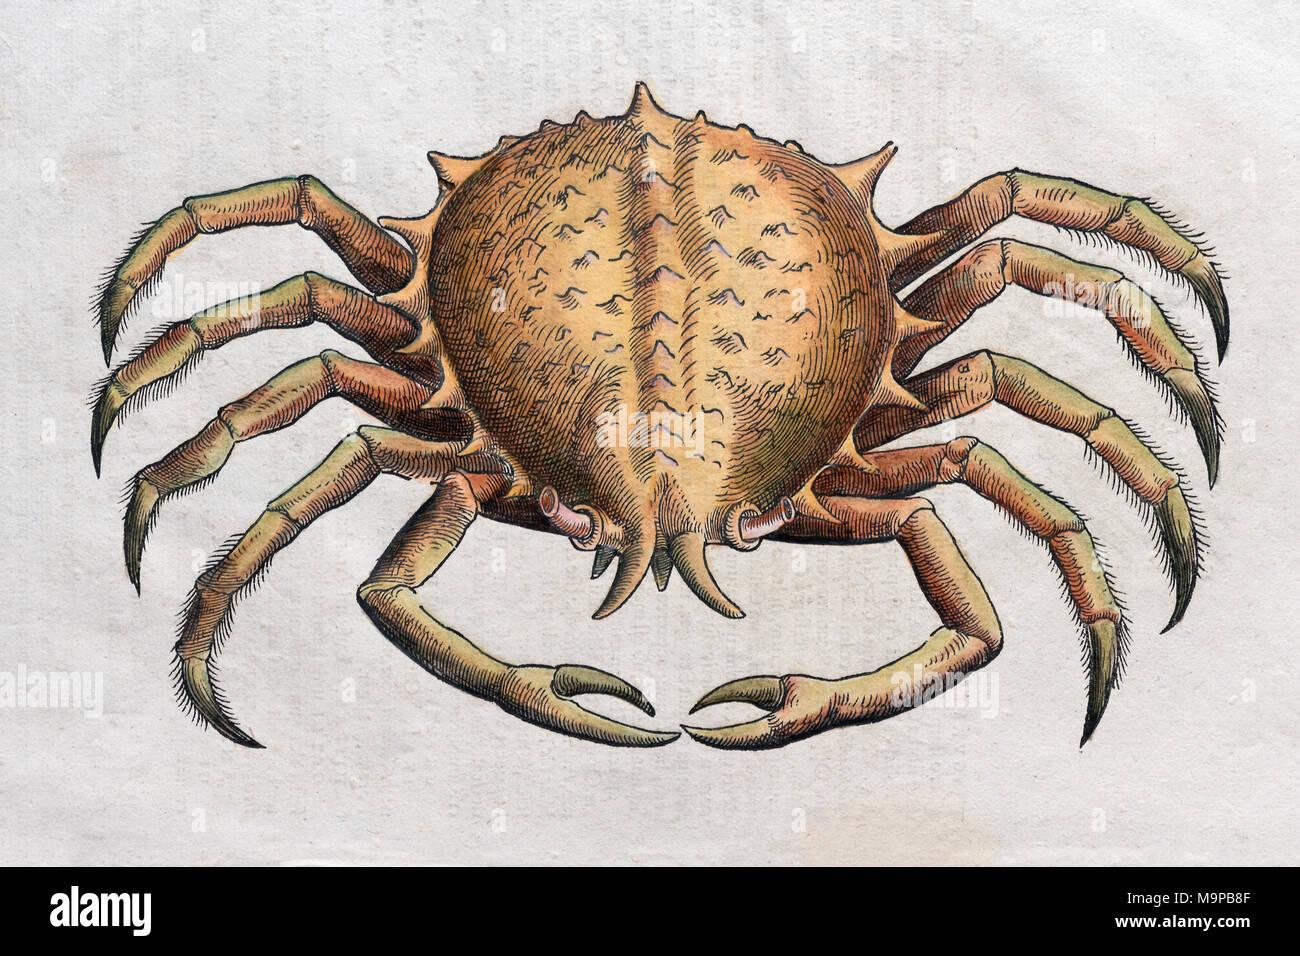 Krabben (Brachyura), Hand - farbige Holzschnitt von Pietro Andrea Mattioli, 1570 Stockbild